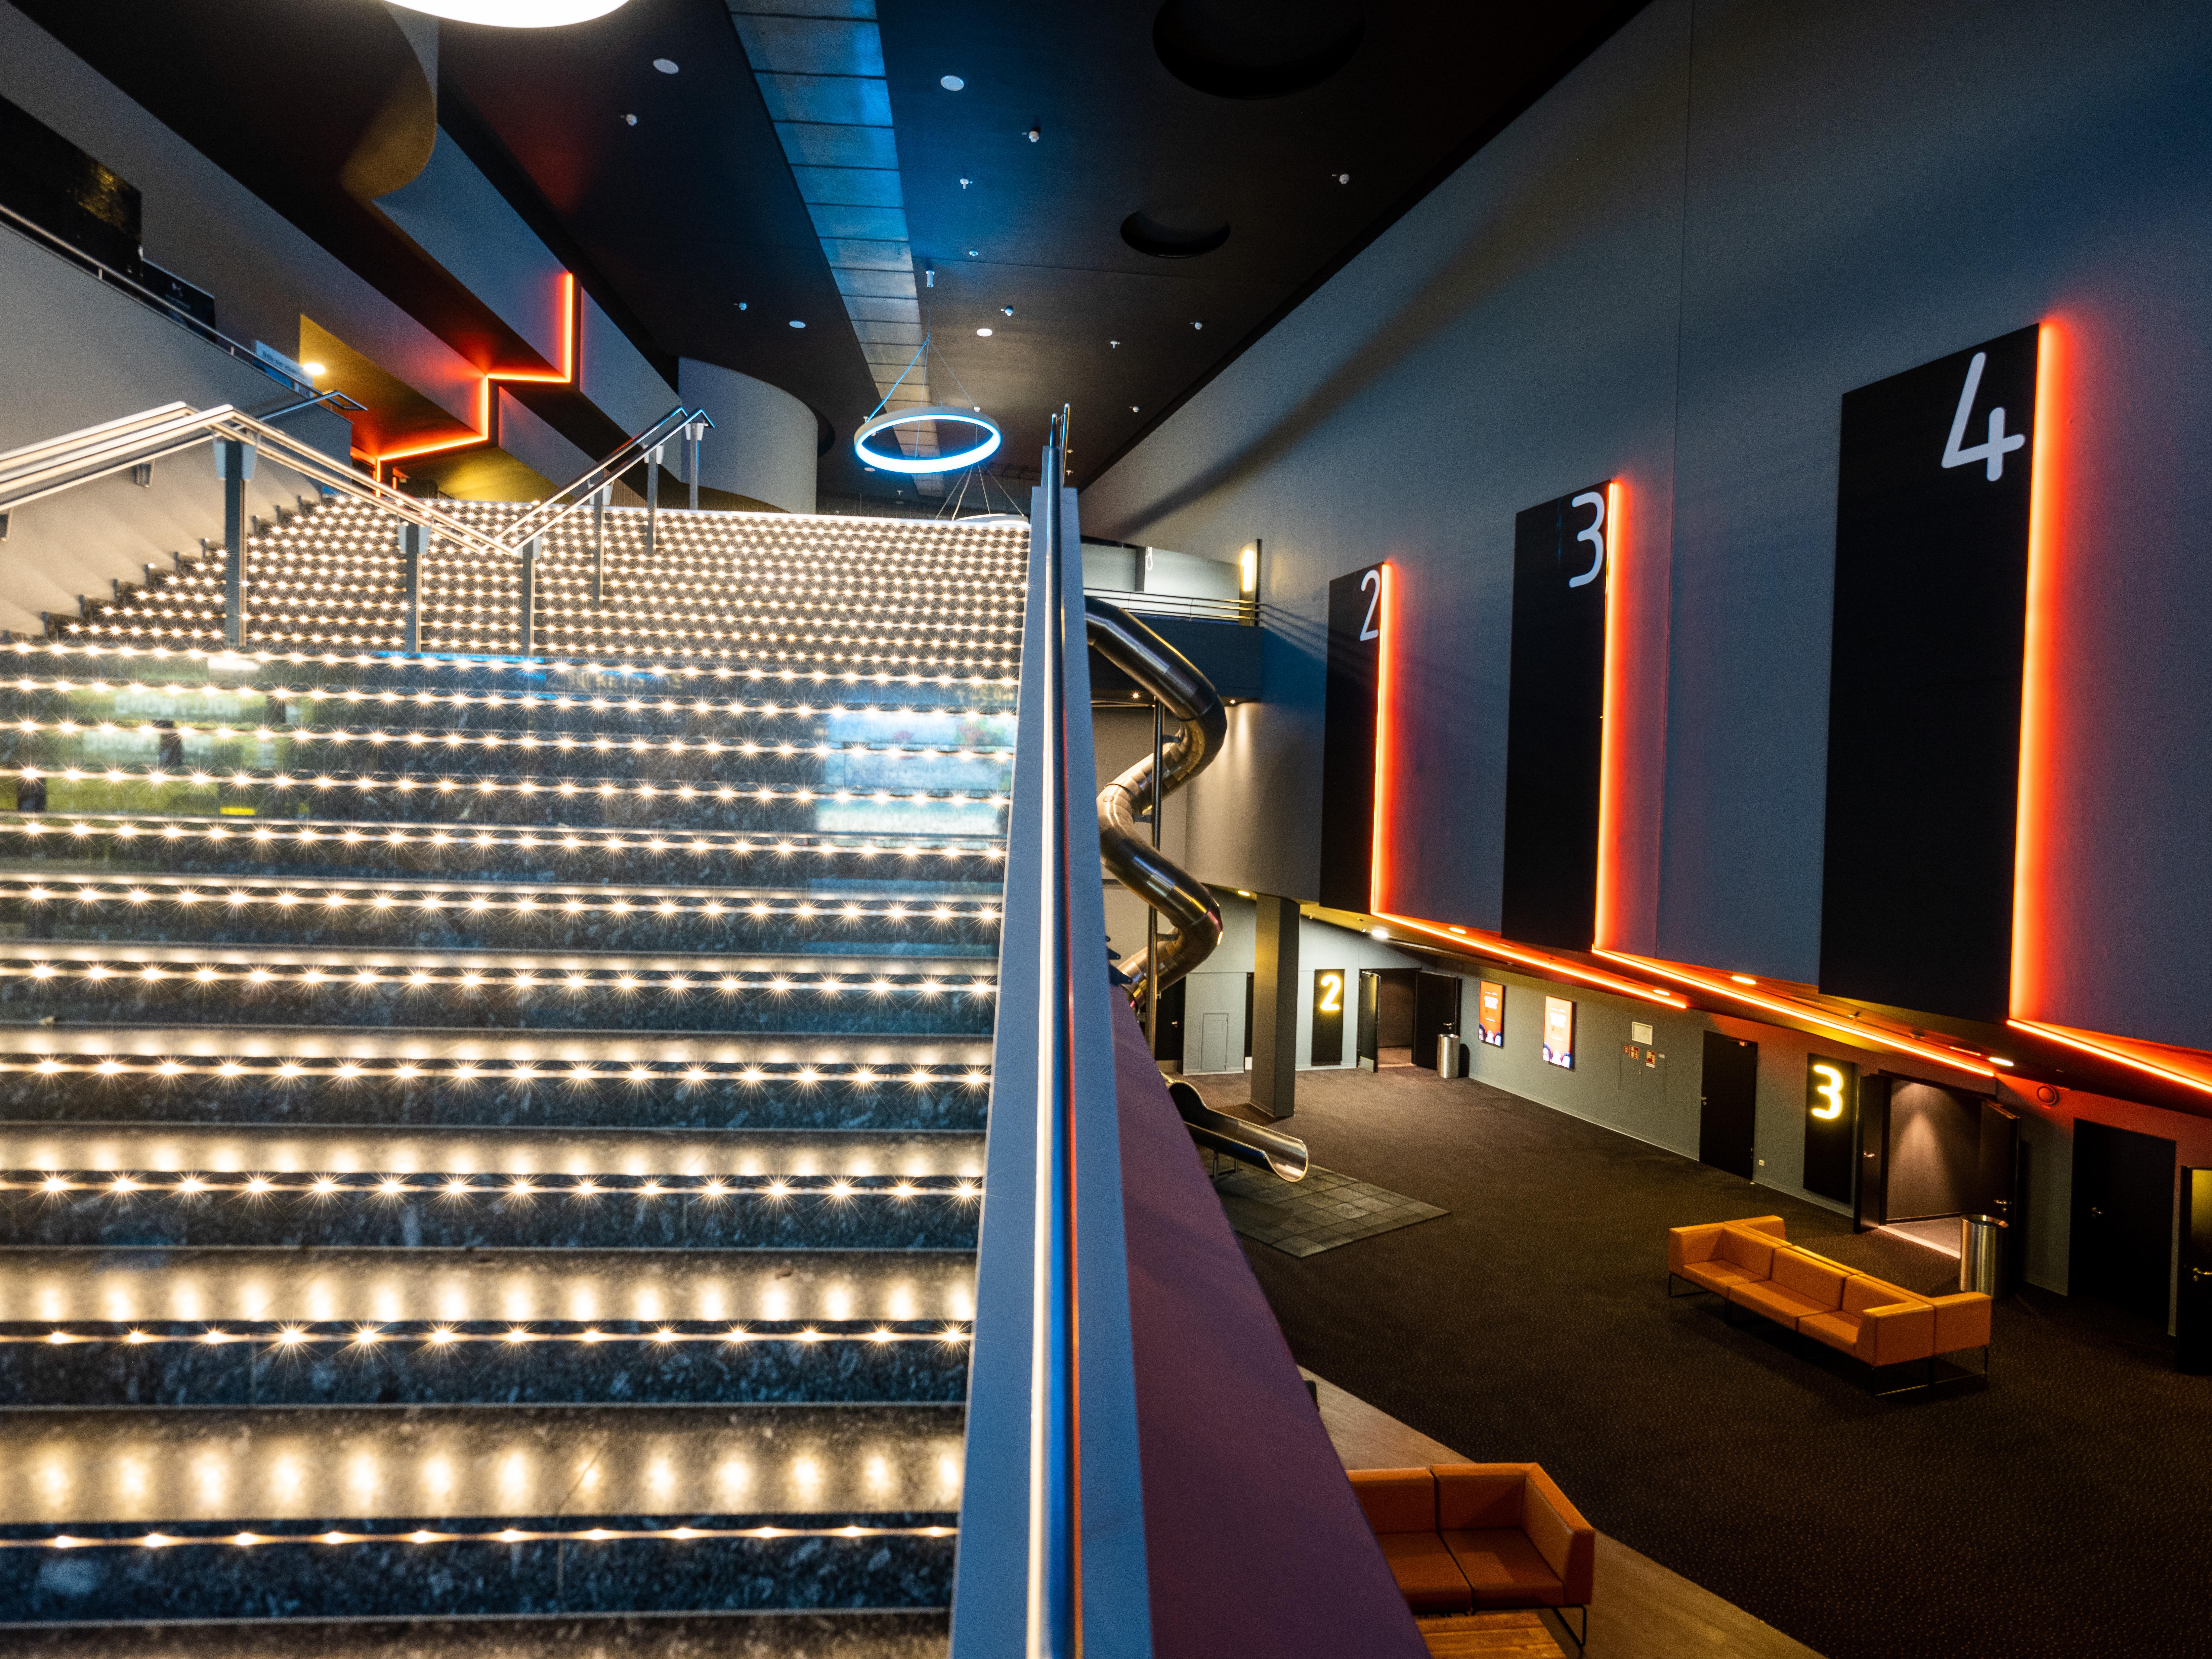 CinemaxX - Wuppertal